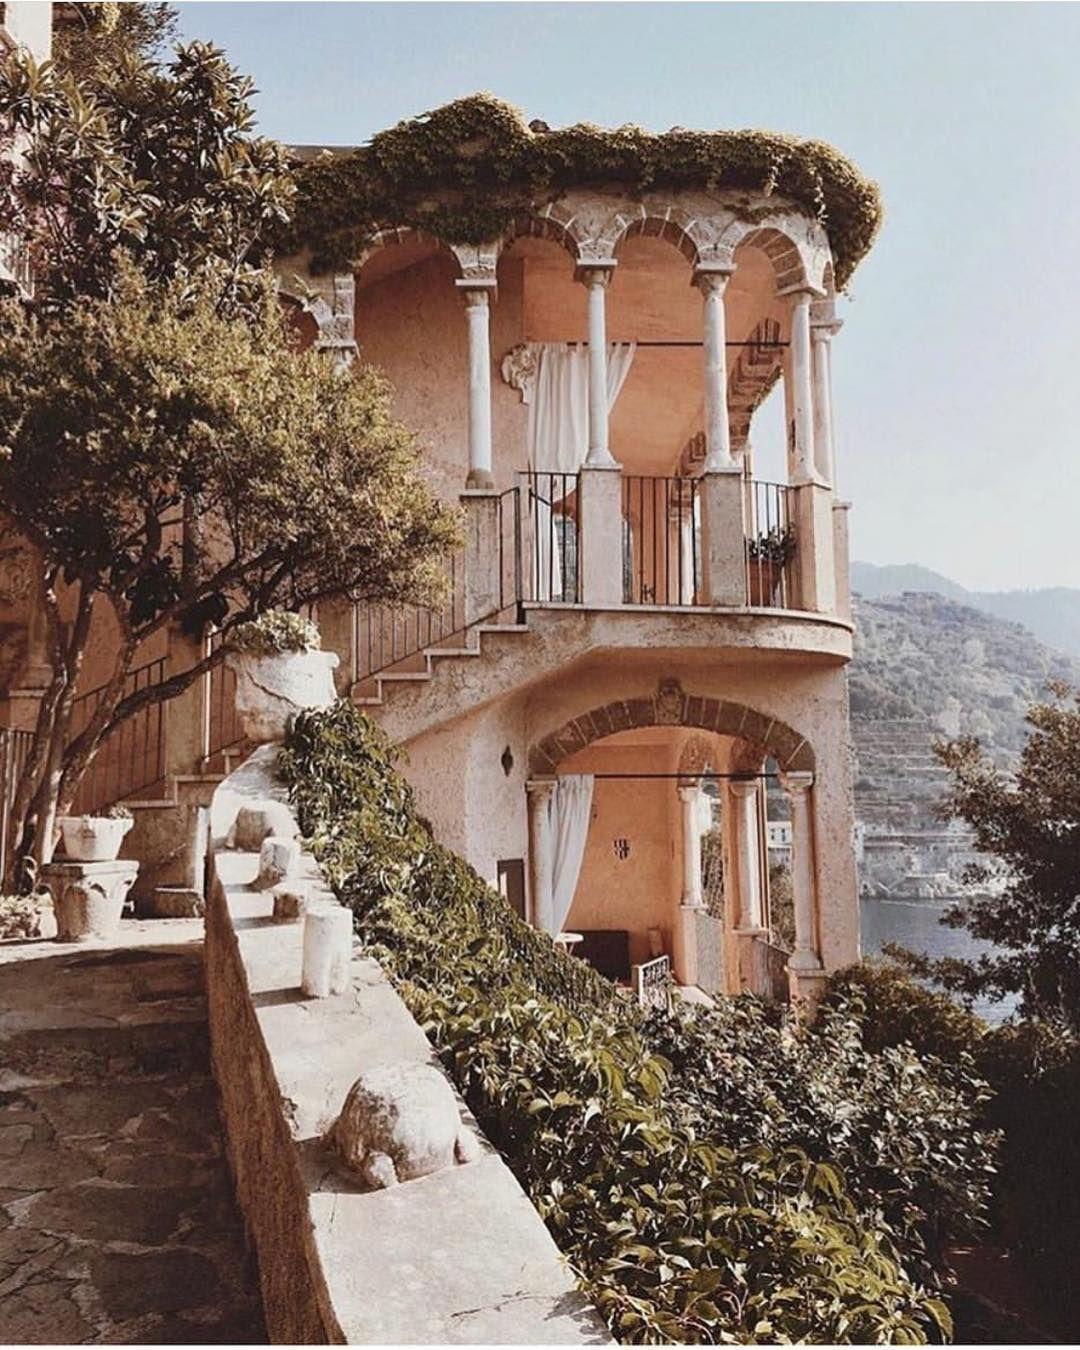 Dreaming of Villa Scarpariello Relais in Marmorata, Italy